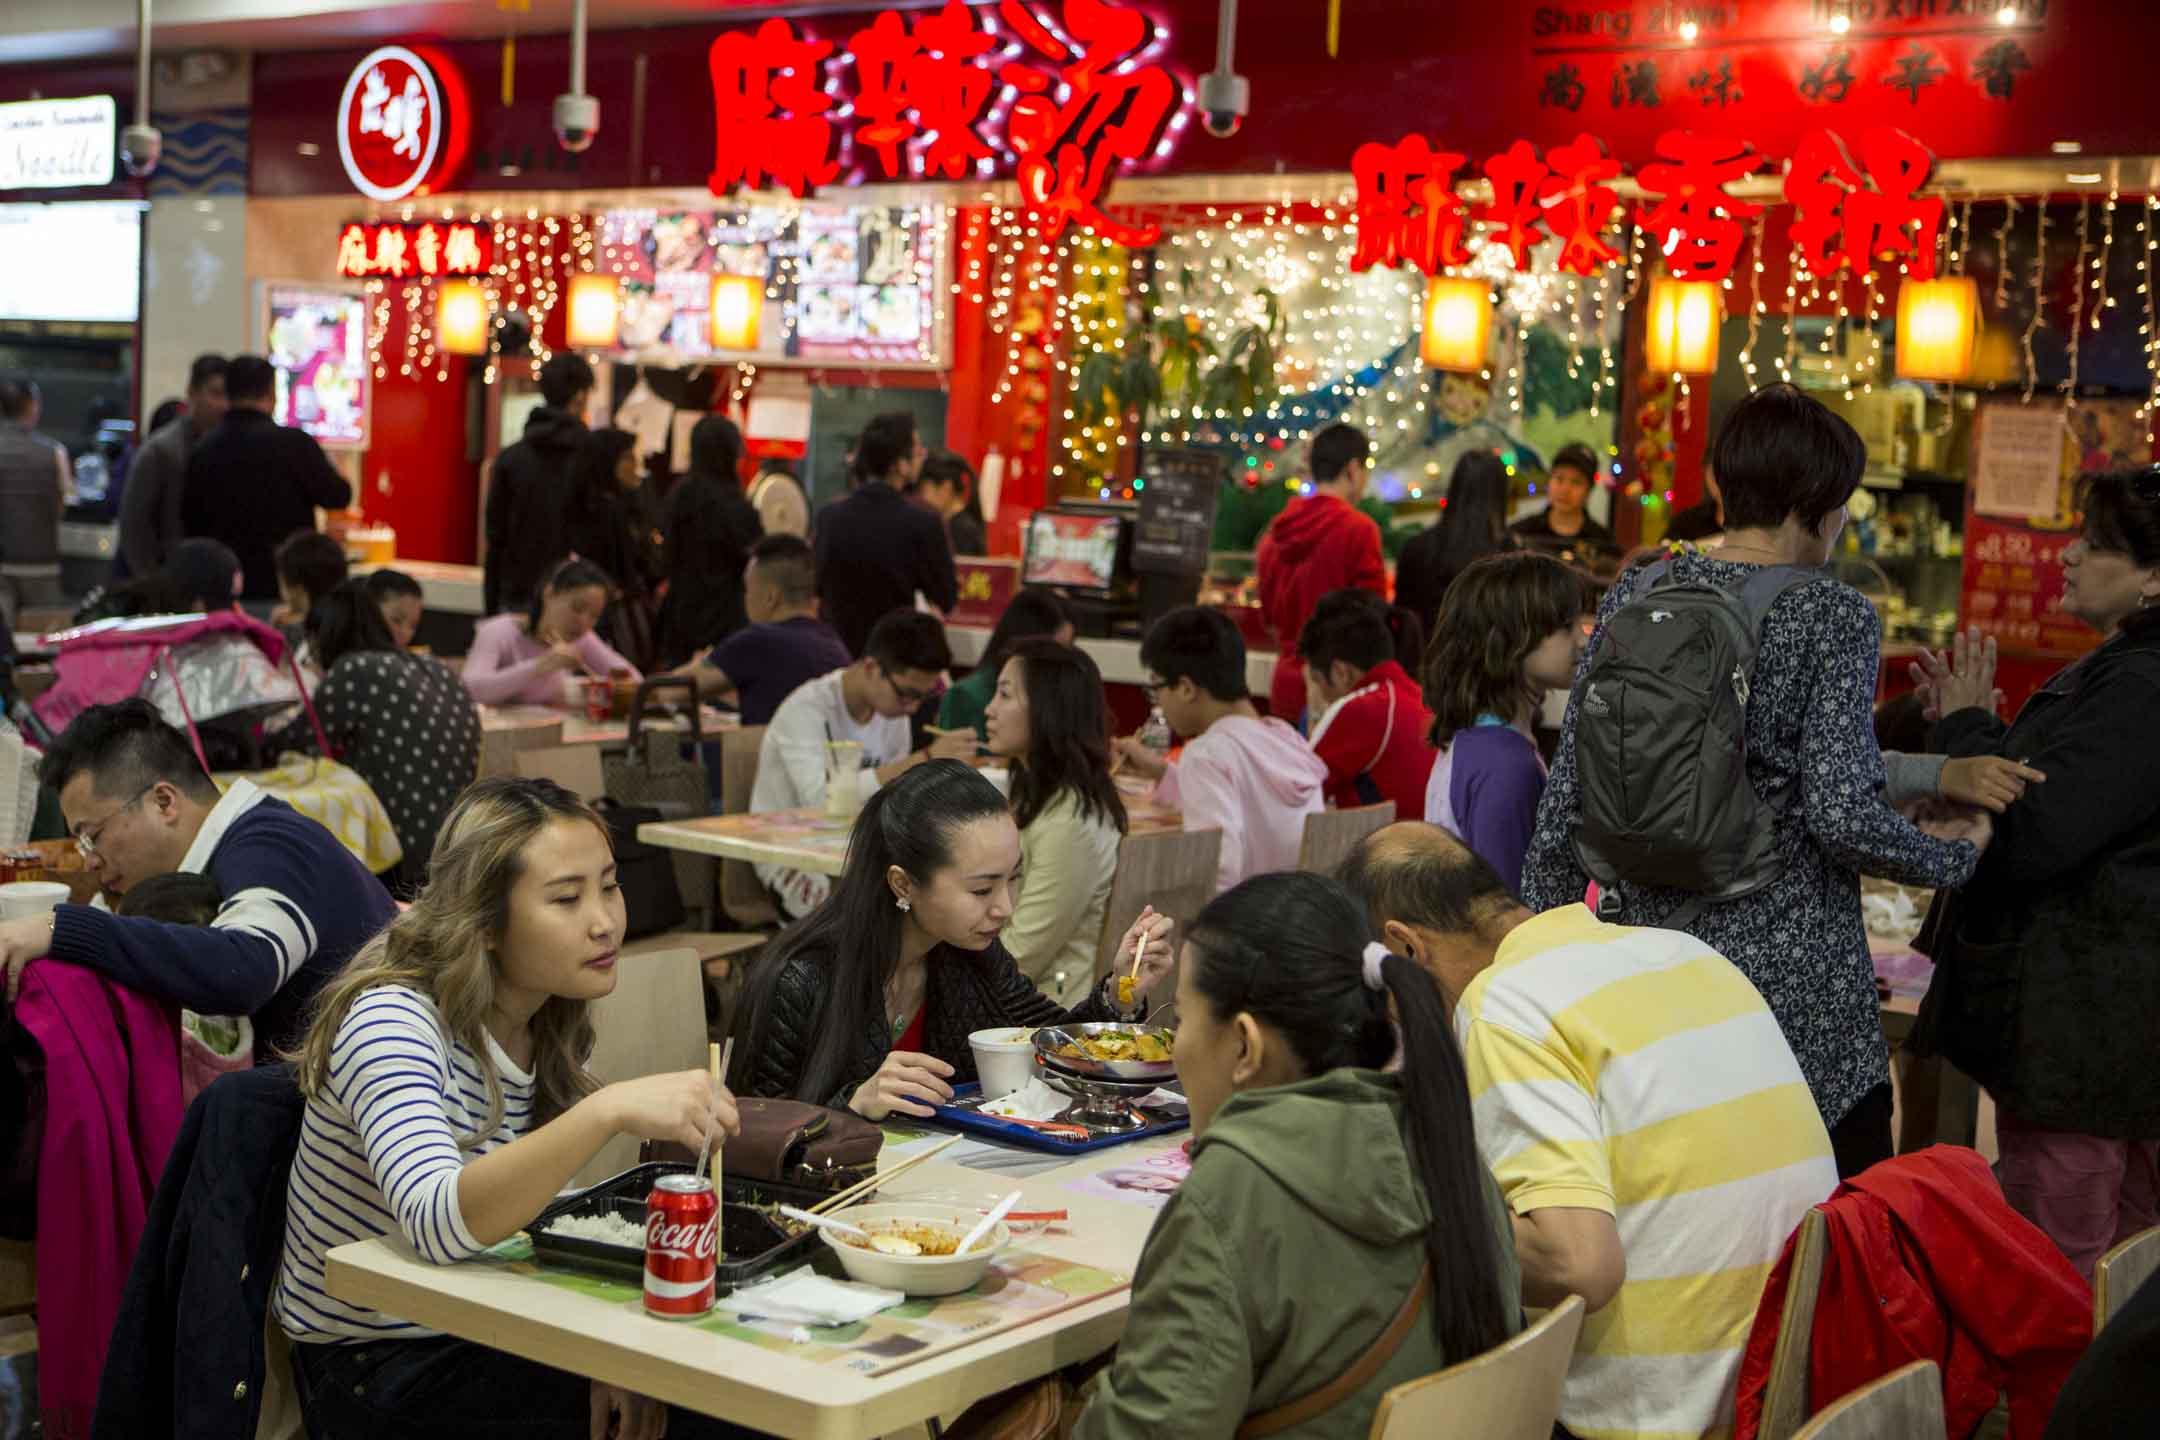 2017年4月18日,紐約法拉盛的一個美食廣場內有不少中式餐廳。 攝:Melanie Stetson Freeman/The Christian Science Monitor via Getty Images)